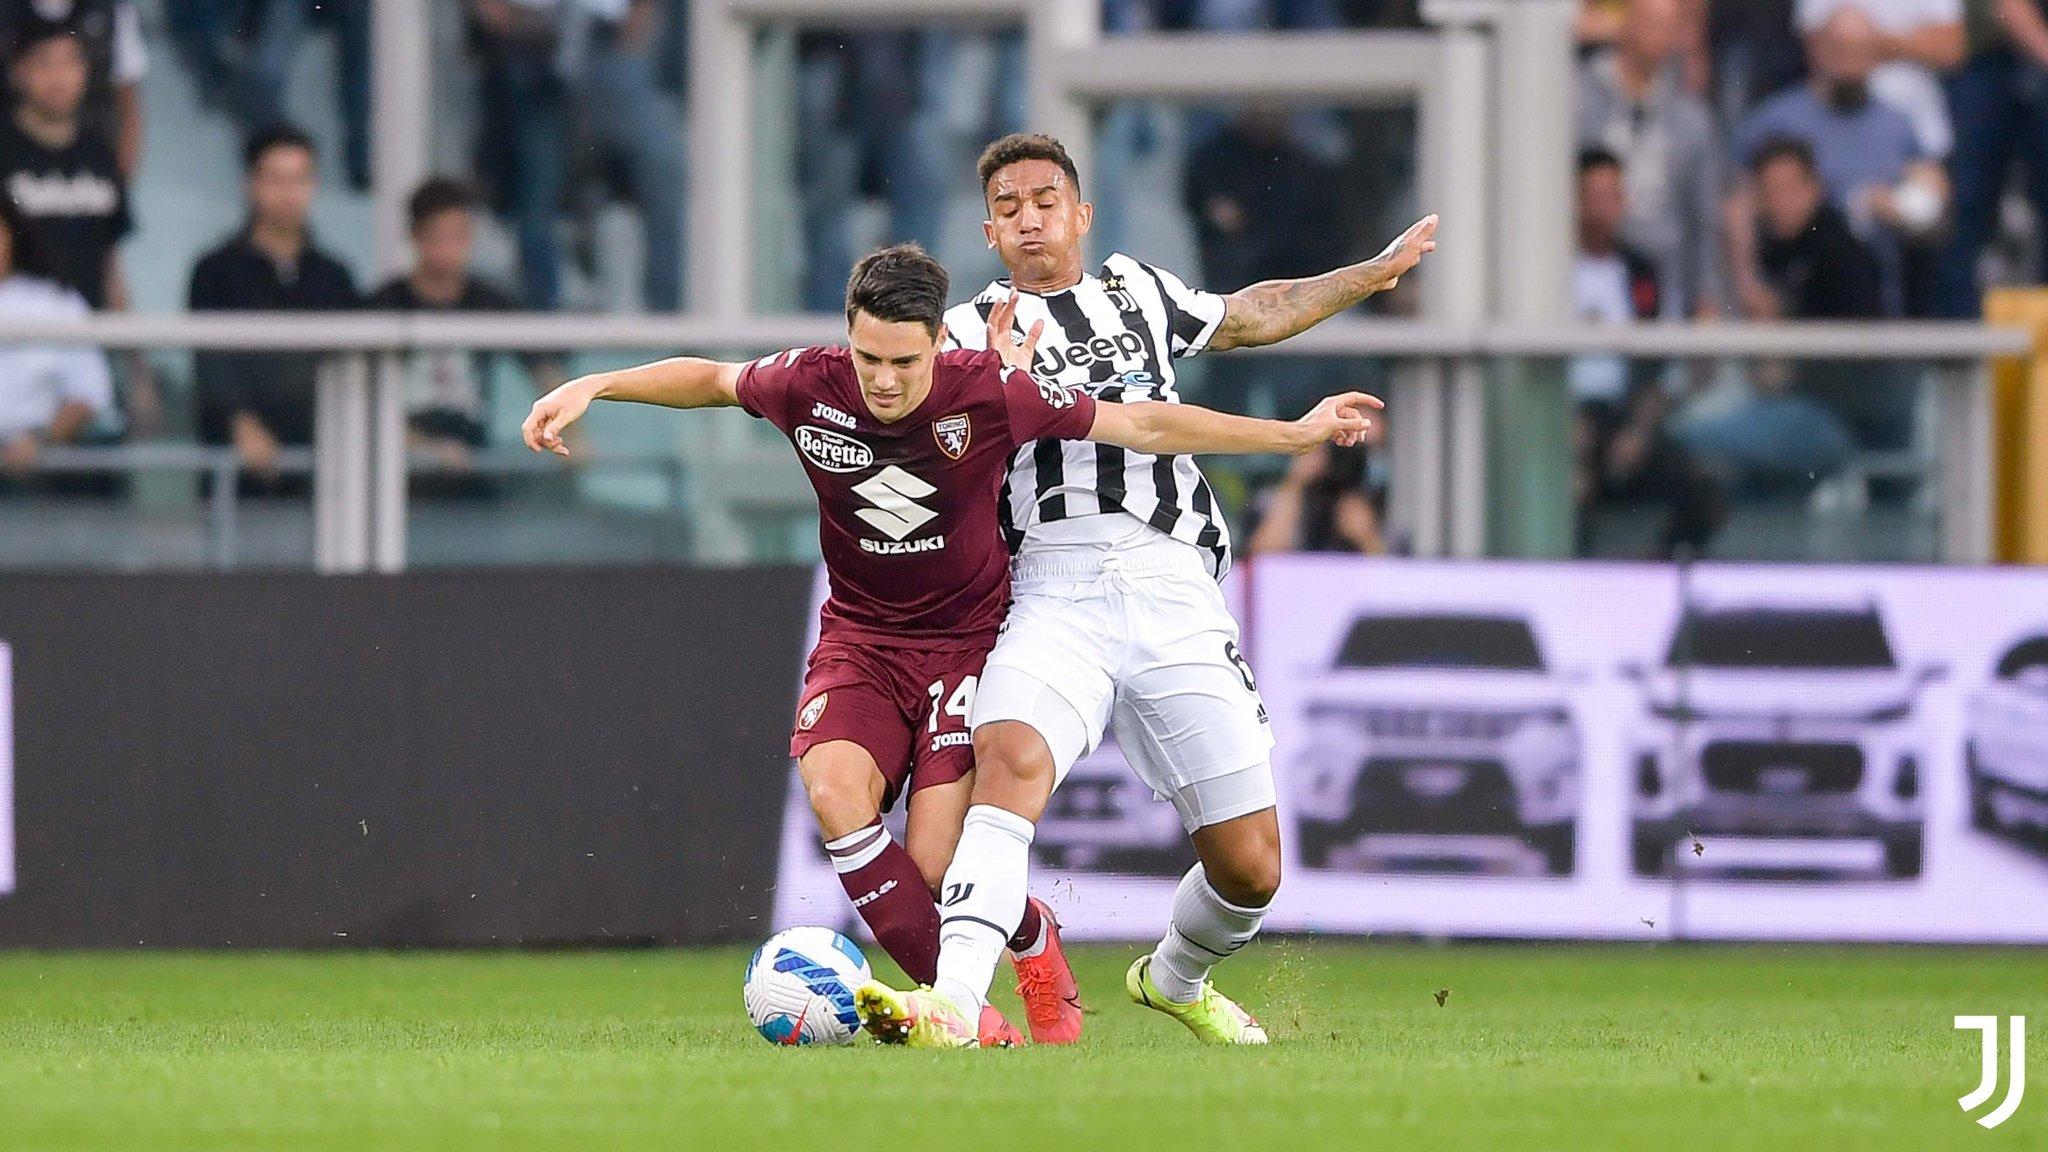 Turin vs Juventus (7)